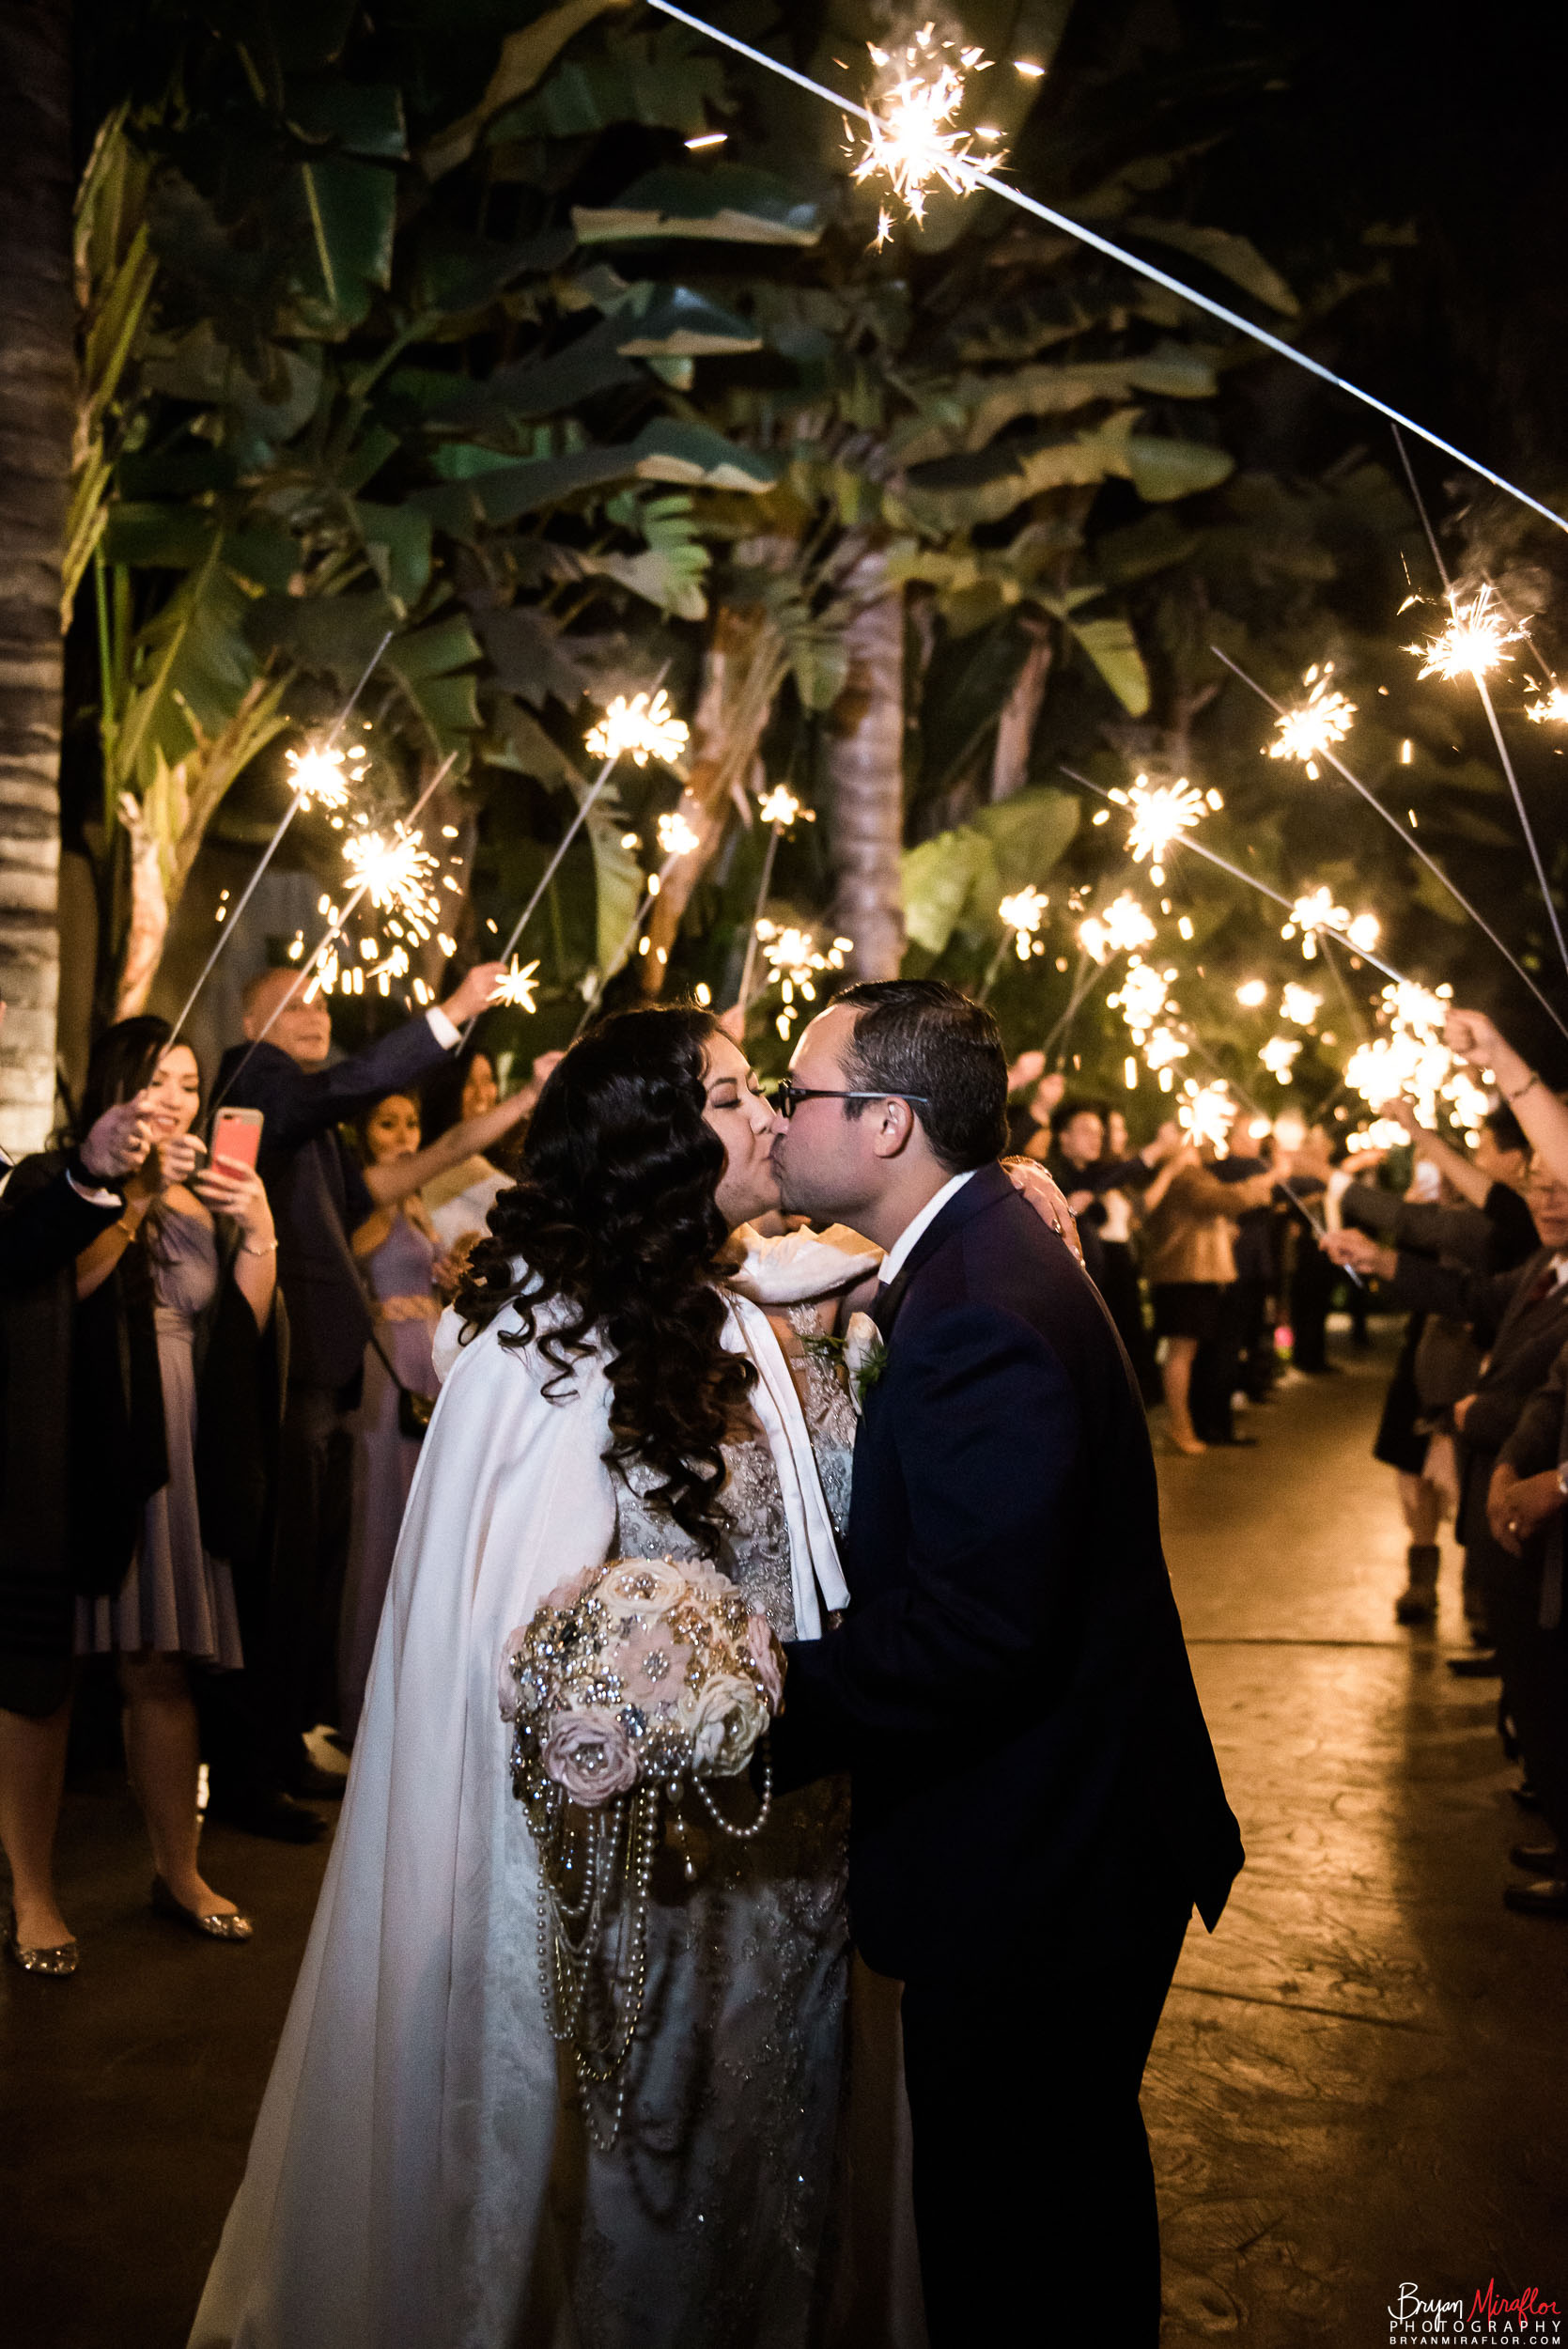 Bryan-Miraflor-Photography-Hannah-Jonathan-Married-Grand-Traditions-Estate-Gardens-Fallbrook-20171222-241.jpg